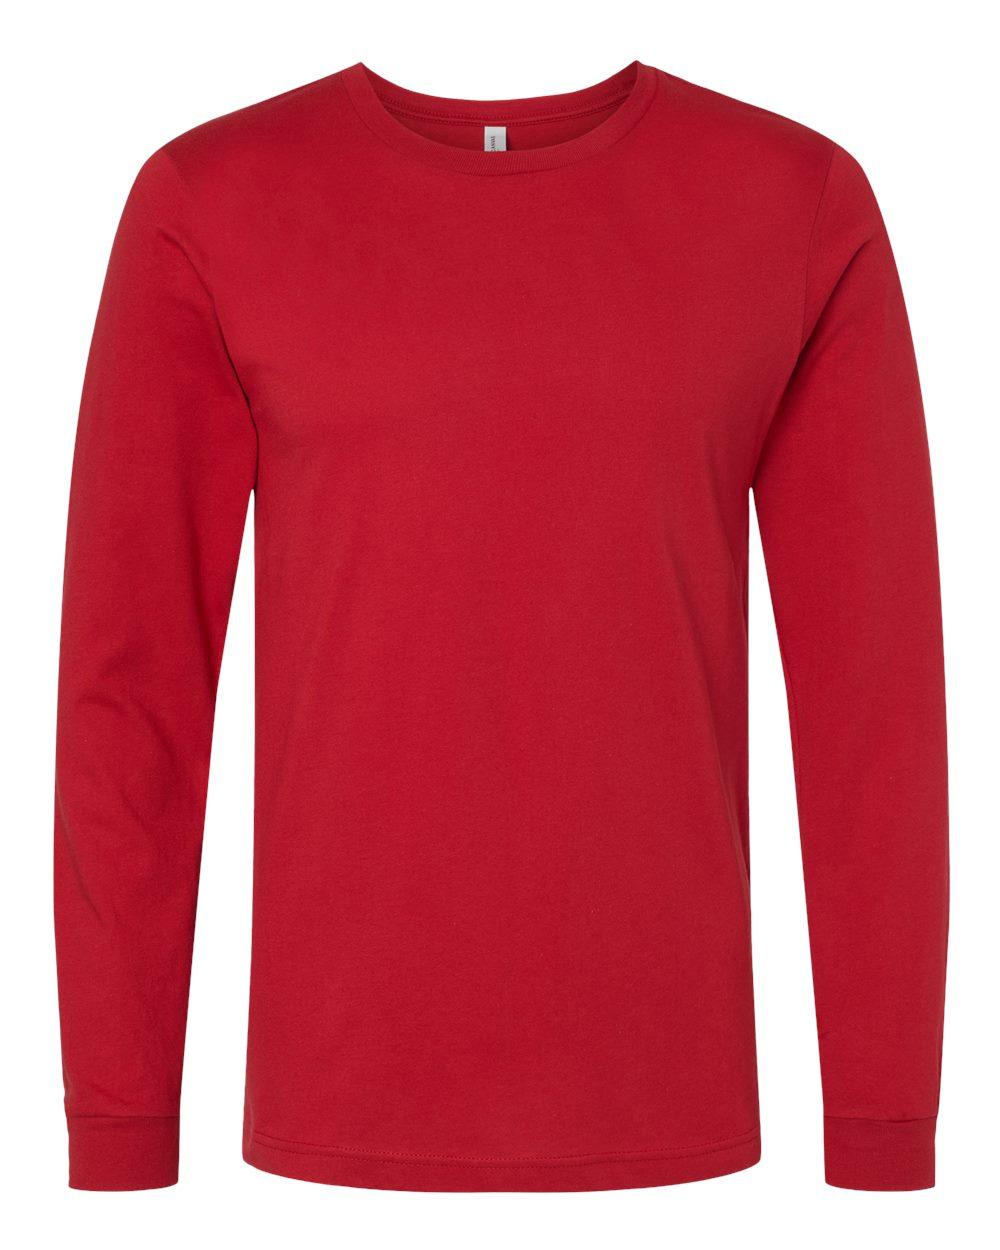 Bella-Canvas-Mens-Blank-Top-Long-Sleeve-Jersey-Tee-T-Shirt-3501-up-to-3XL thumbnail 24